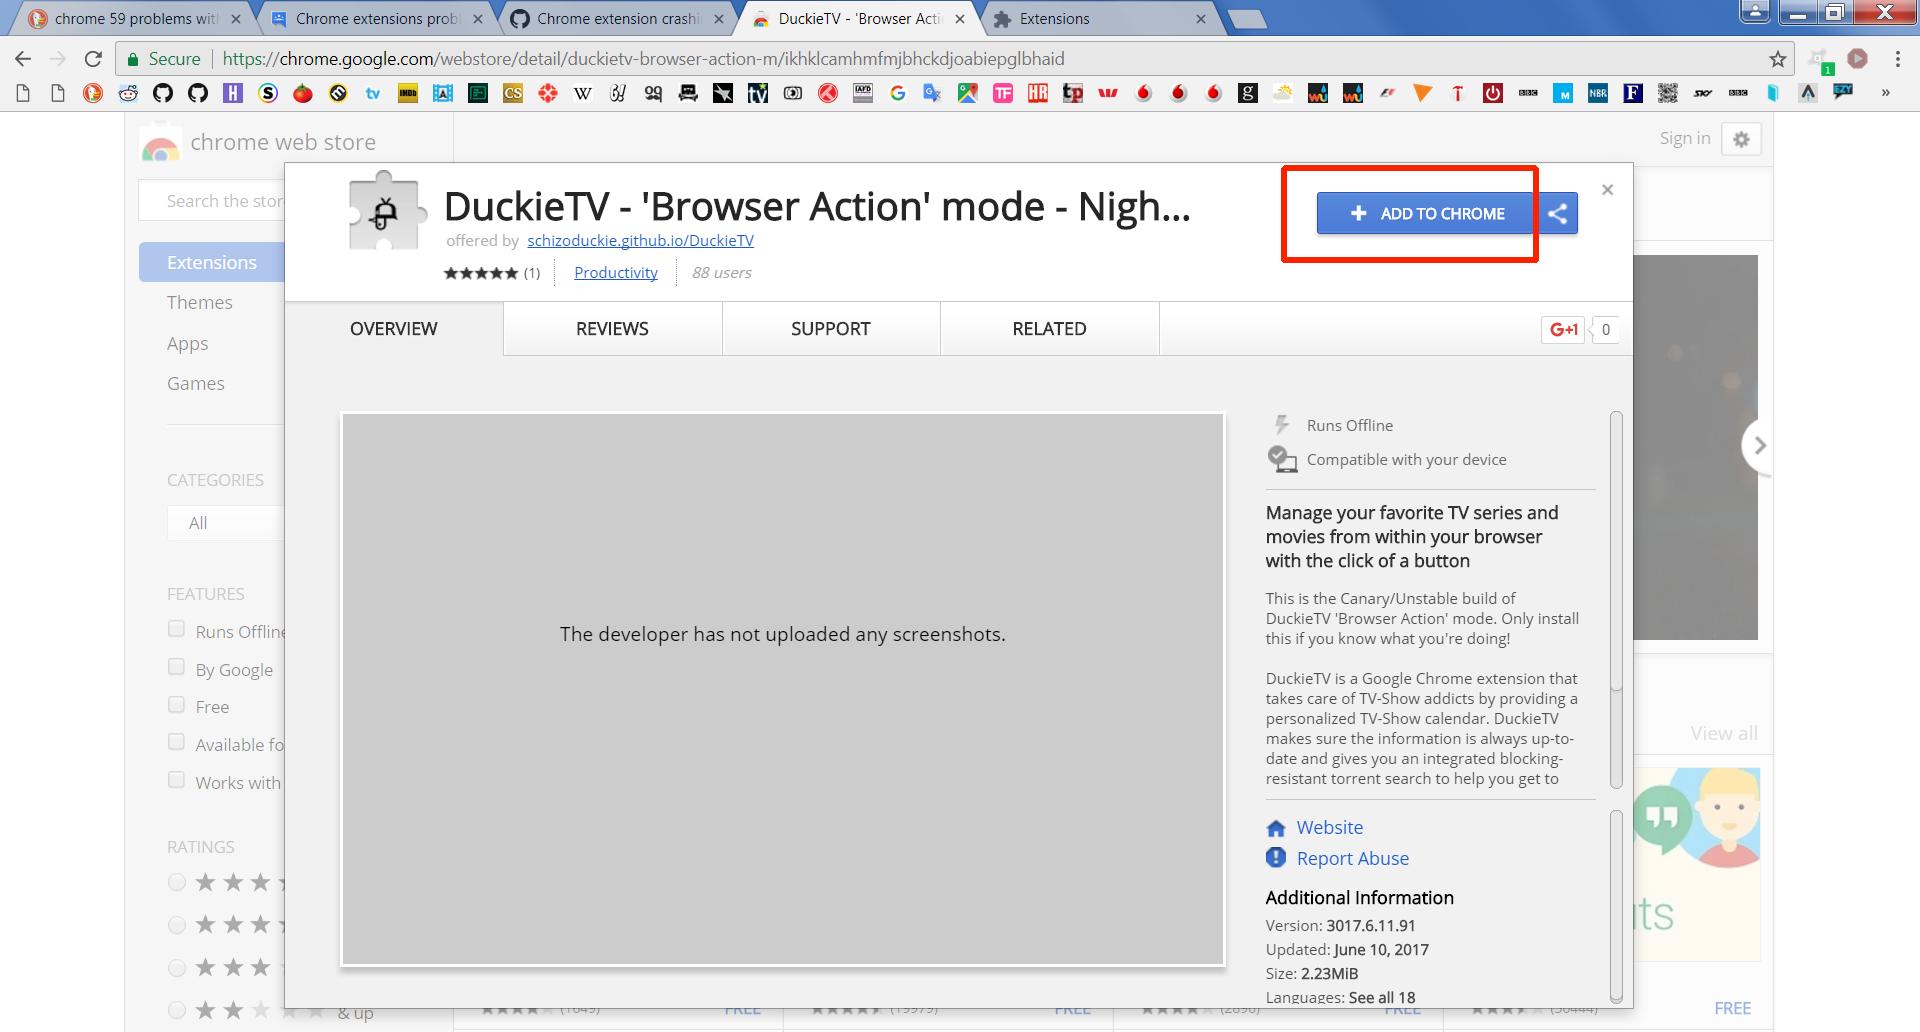 Chrome extension crashing · Issue #905 · SchizoDuckie/DuckieTV · GitHub